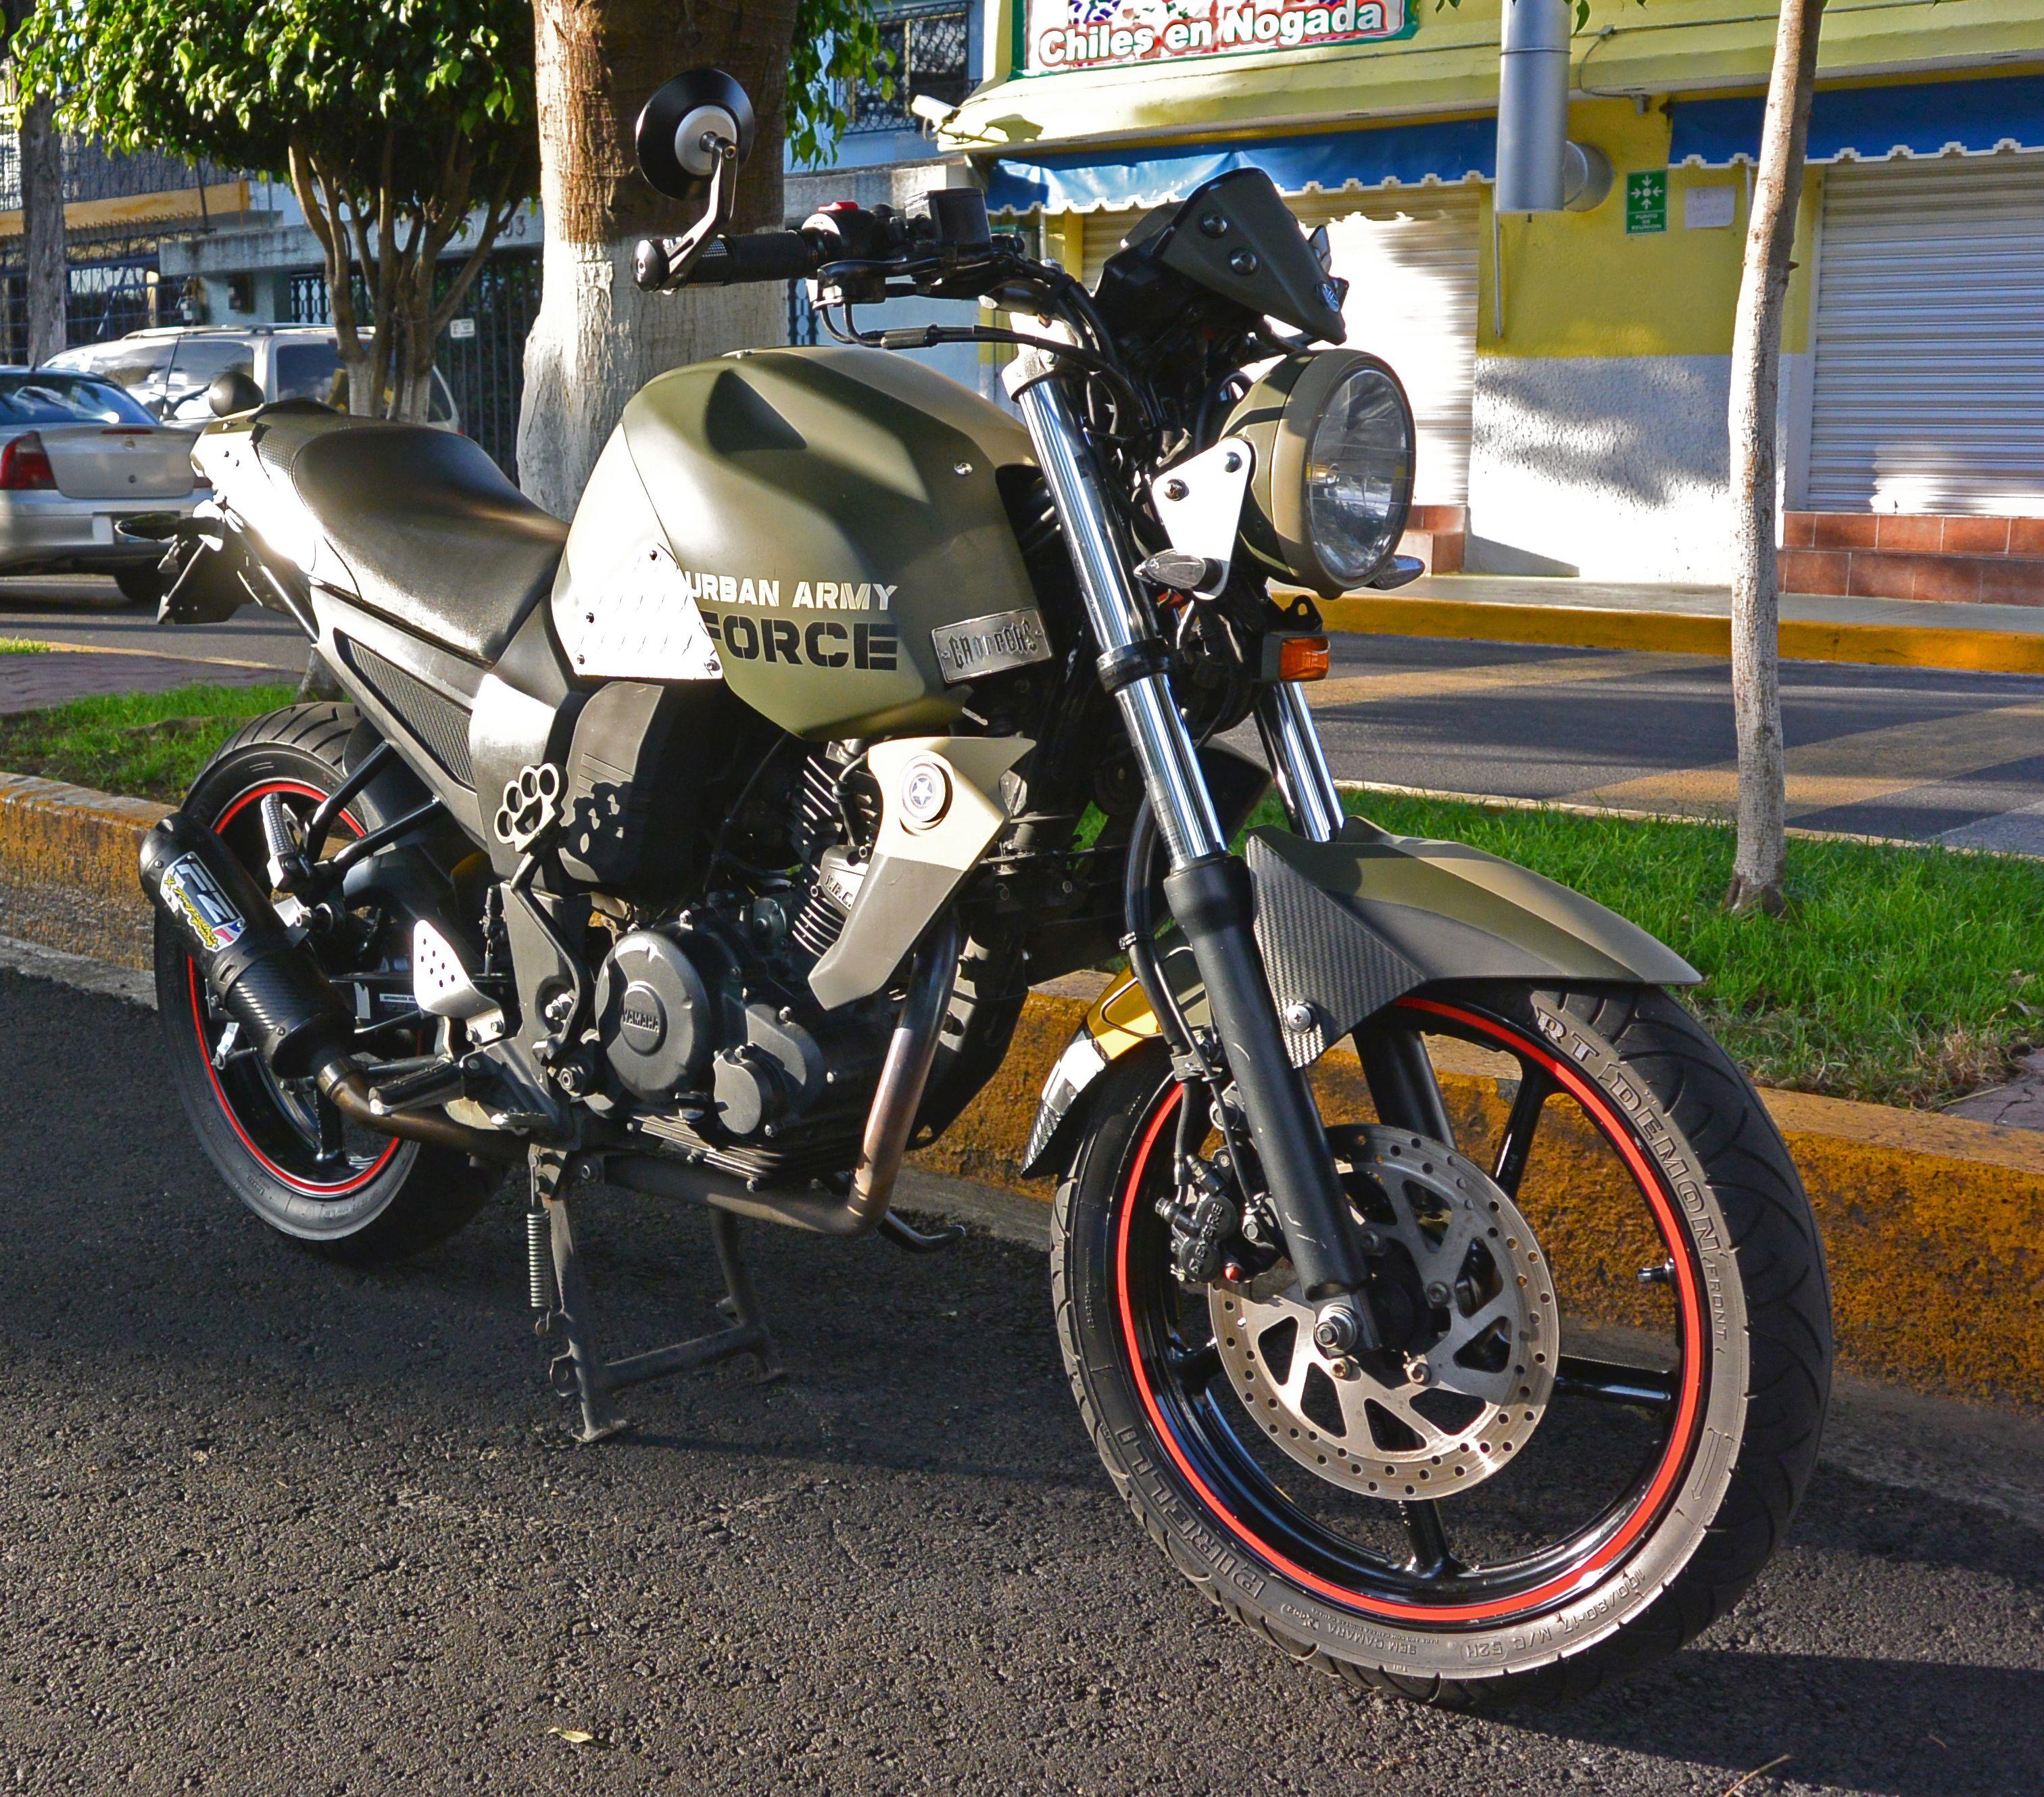 Fz 16, Scrambler, Yamaha Fz, Jeeps, Motorcycles, Biking, Motorbikes, Bicycling,